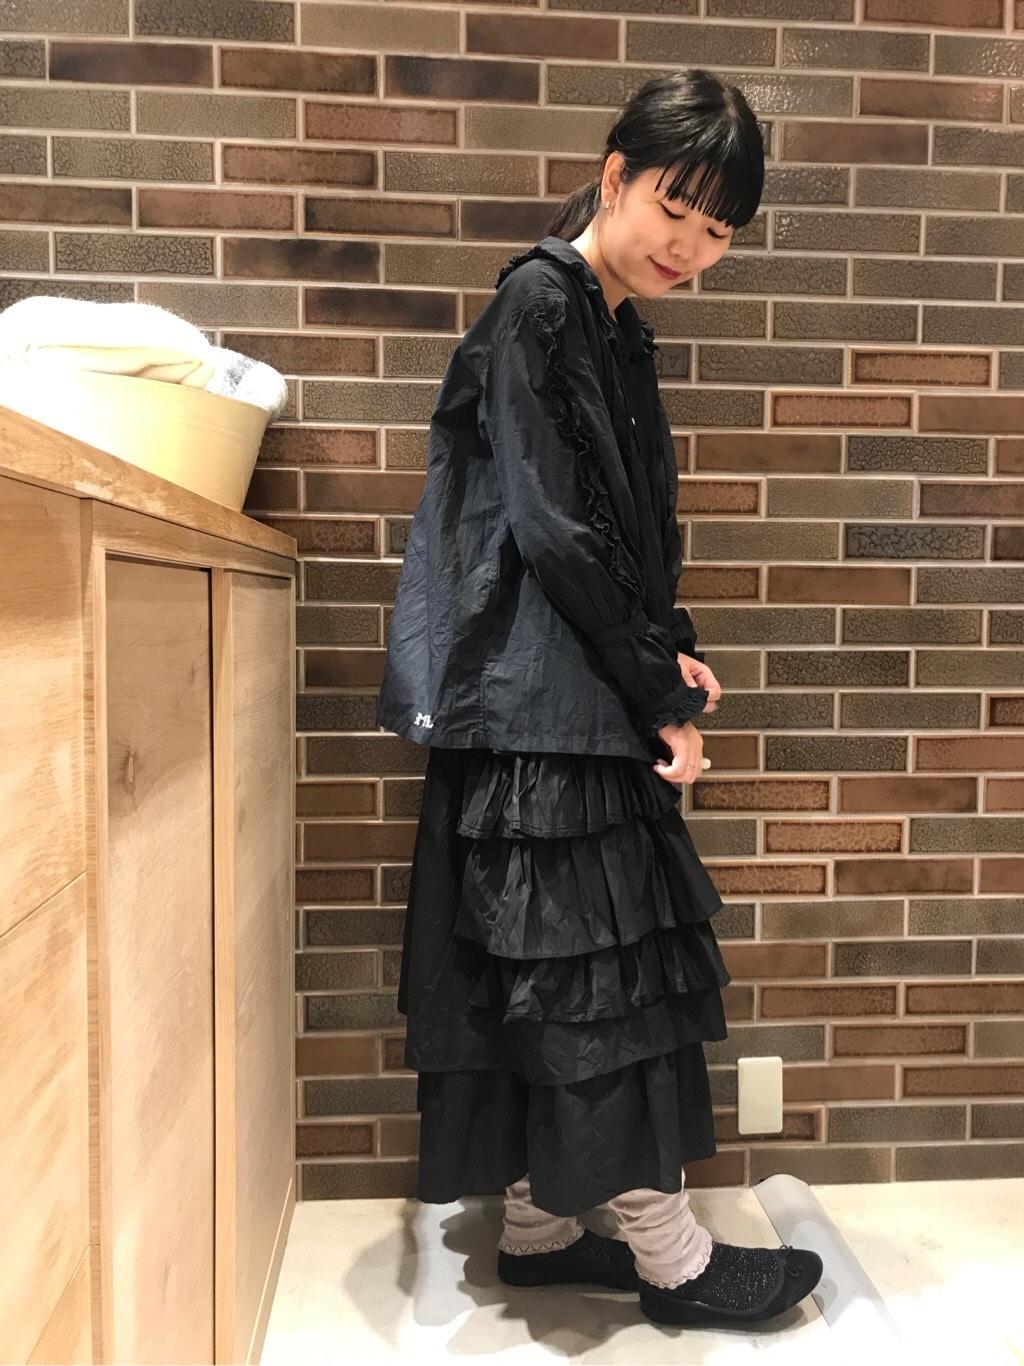 chambre de charme キラリナ京王吉祥寺 身長:161cm 2019.11.08